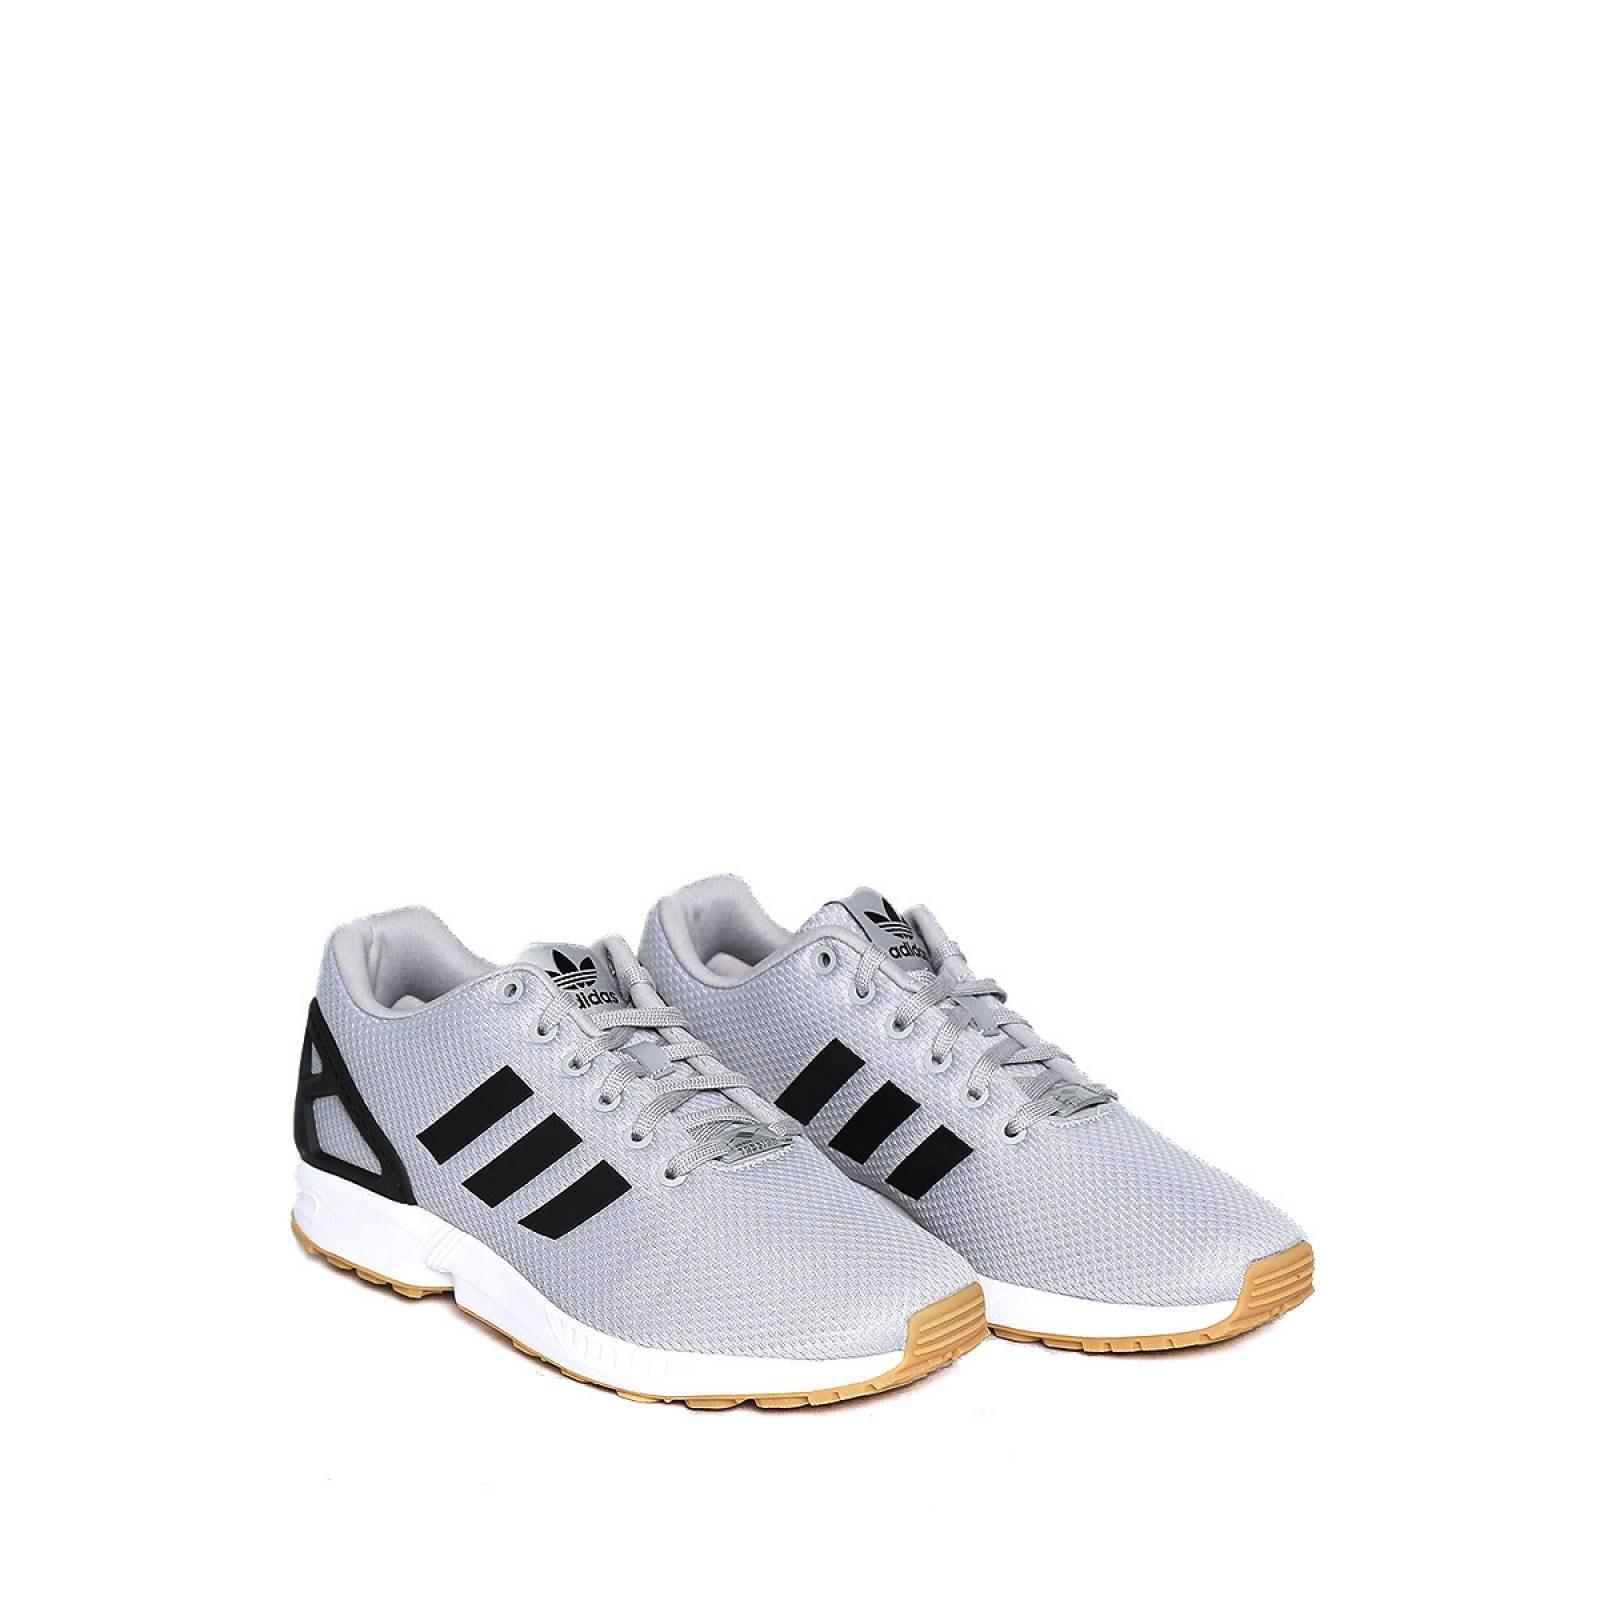 Tenis Grises Adidas Originals Zx Flux by Adidas